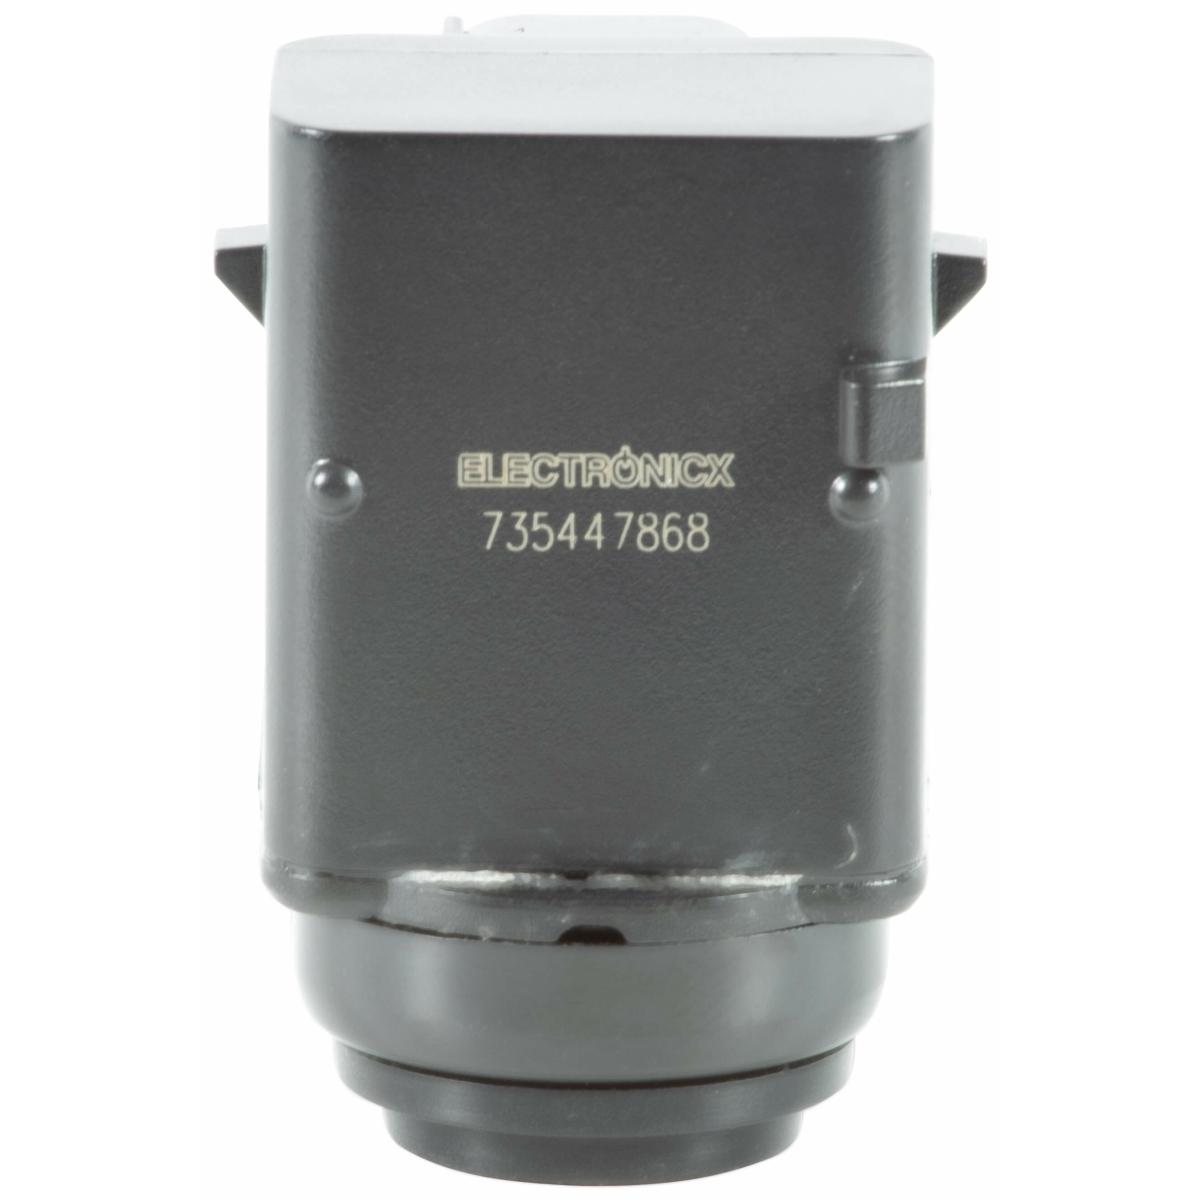 Park sensor 735447868 for Daihatsu PDC Parktronic